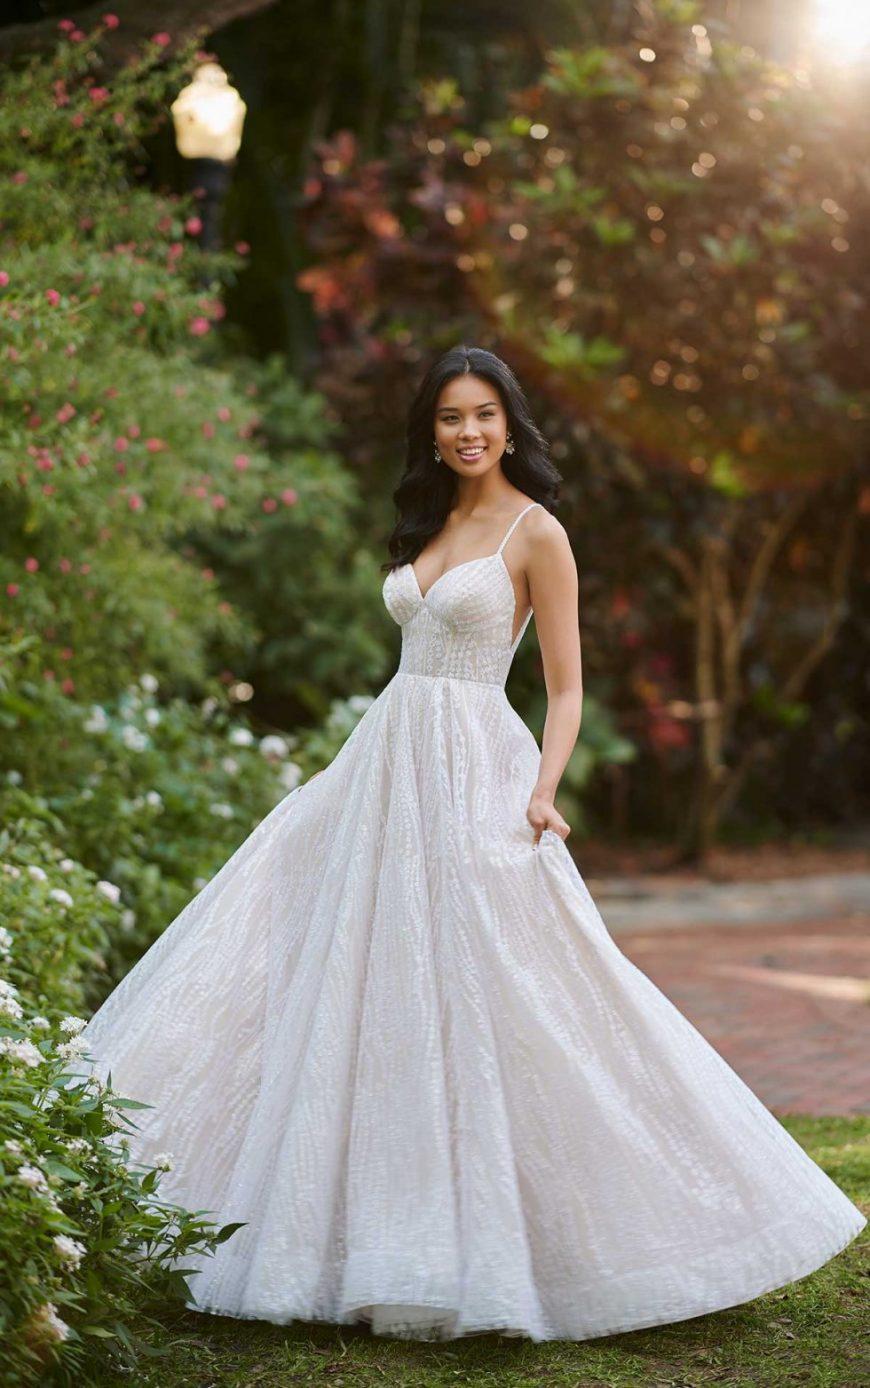 A-line Wedding dress Ballgown sweetheart Neckline Shoestring straps Open V-back Glitter Shimmer Princess D3152 Essense of Australia Tuscany Bridal